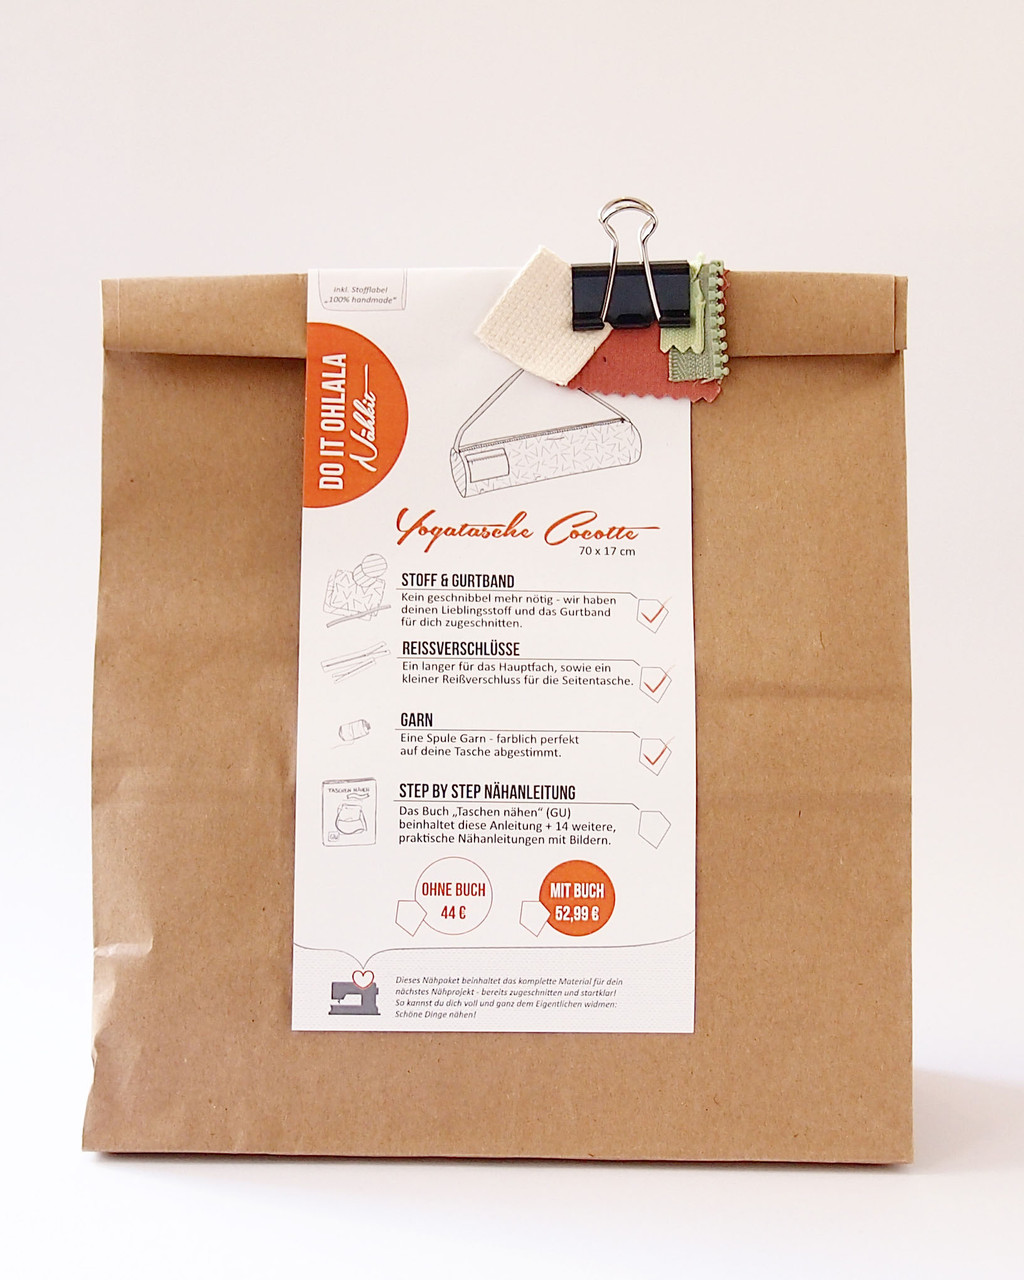 Verpackung Nähkit